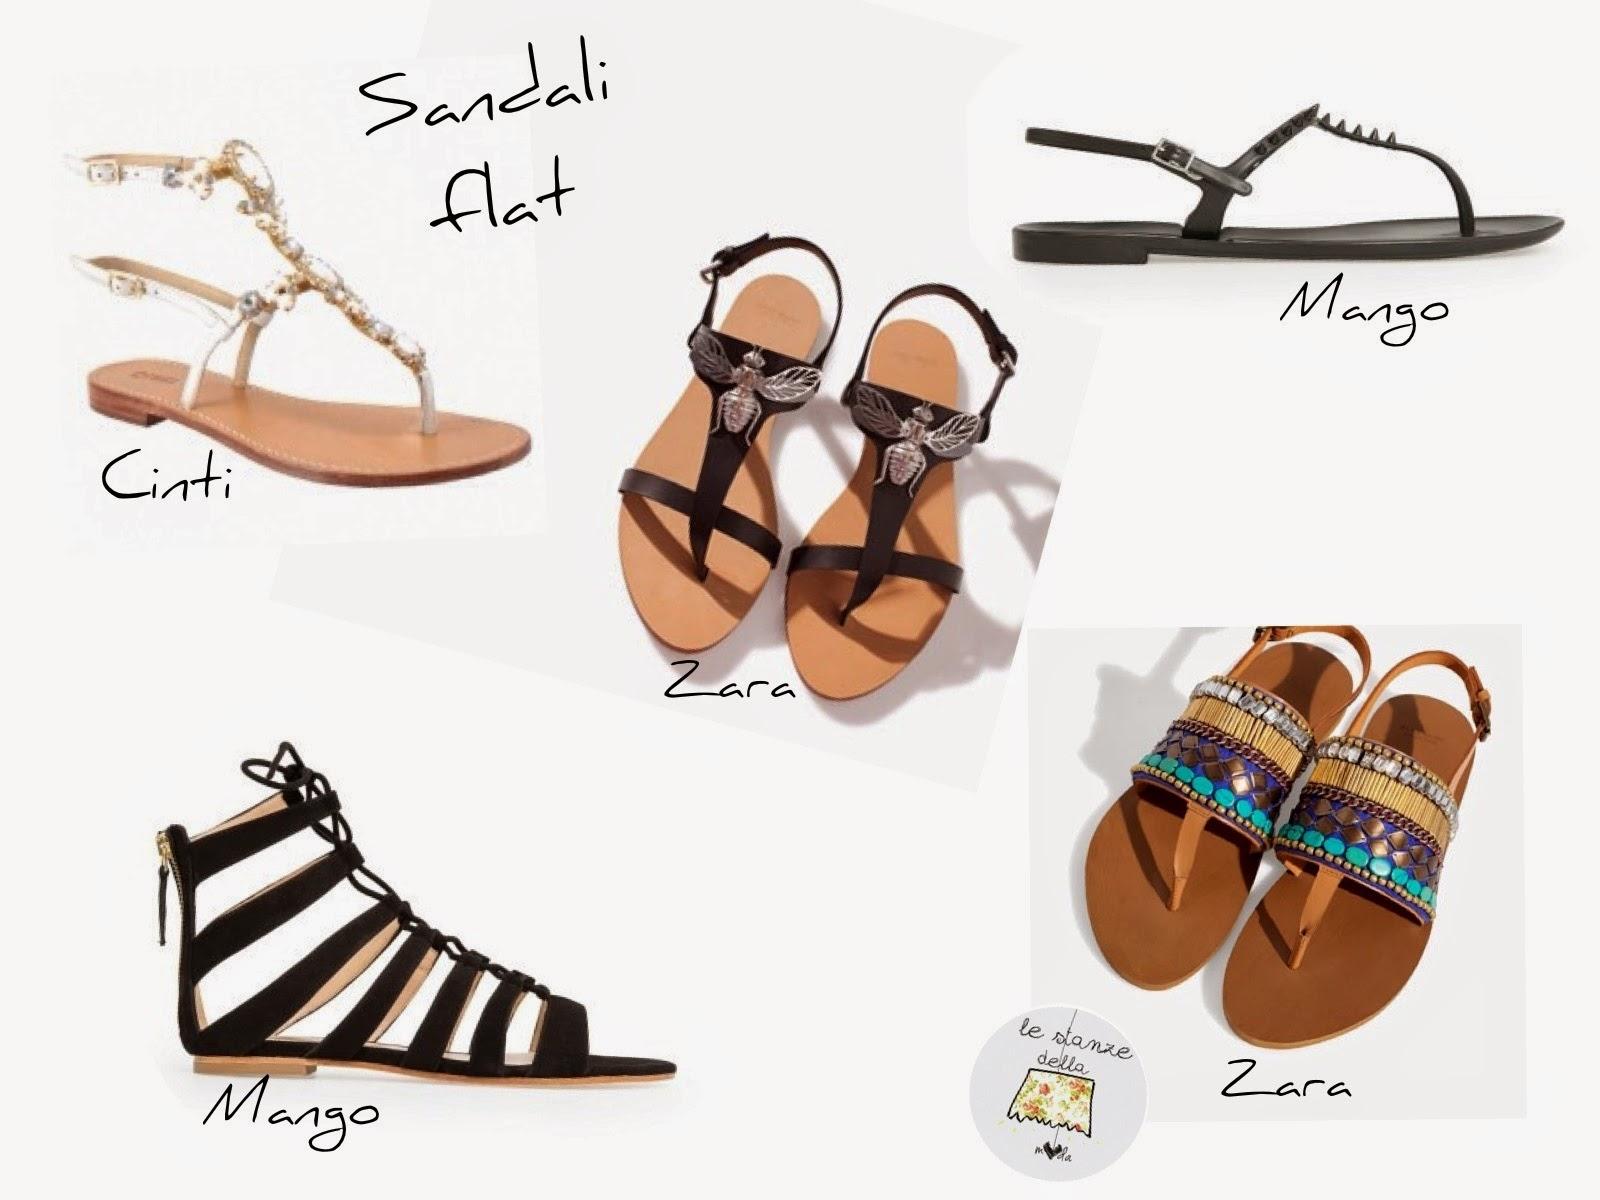 scarpe e scarpe, scarpe 2014 estate, scarpe 2014, sandali flat